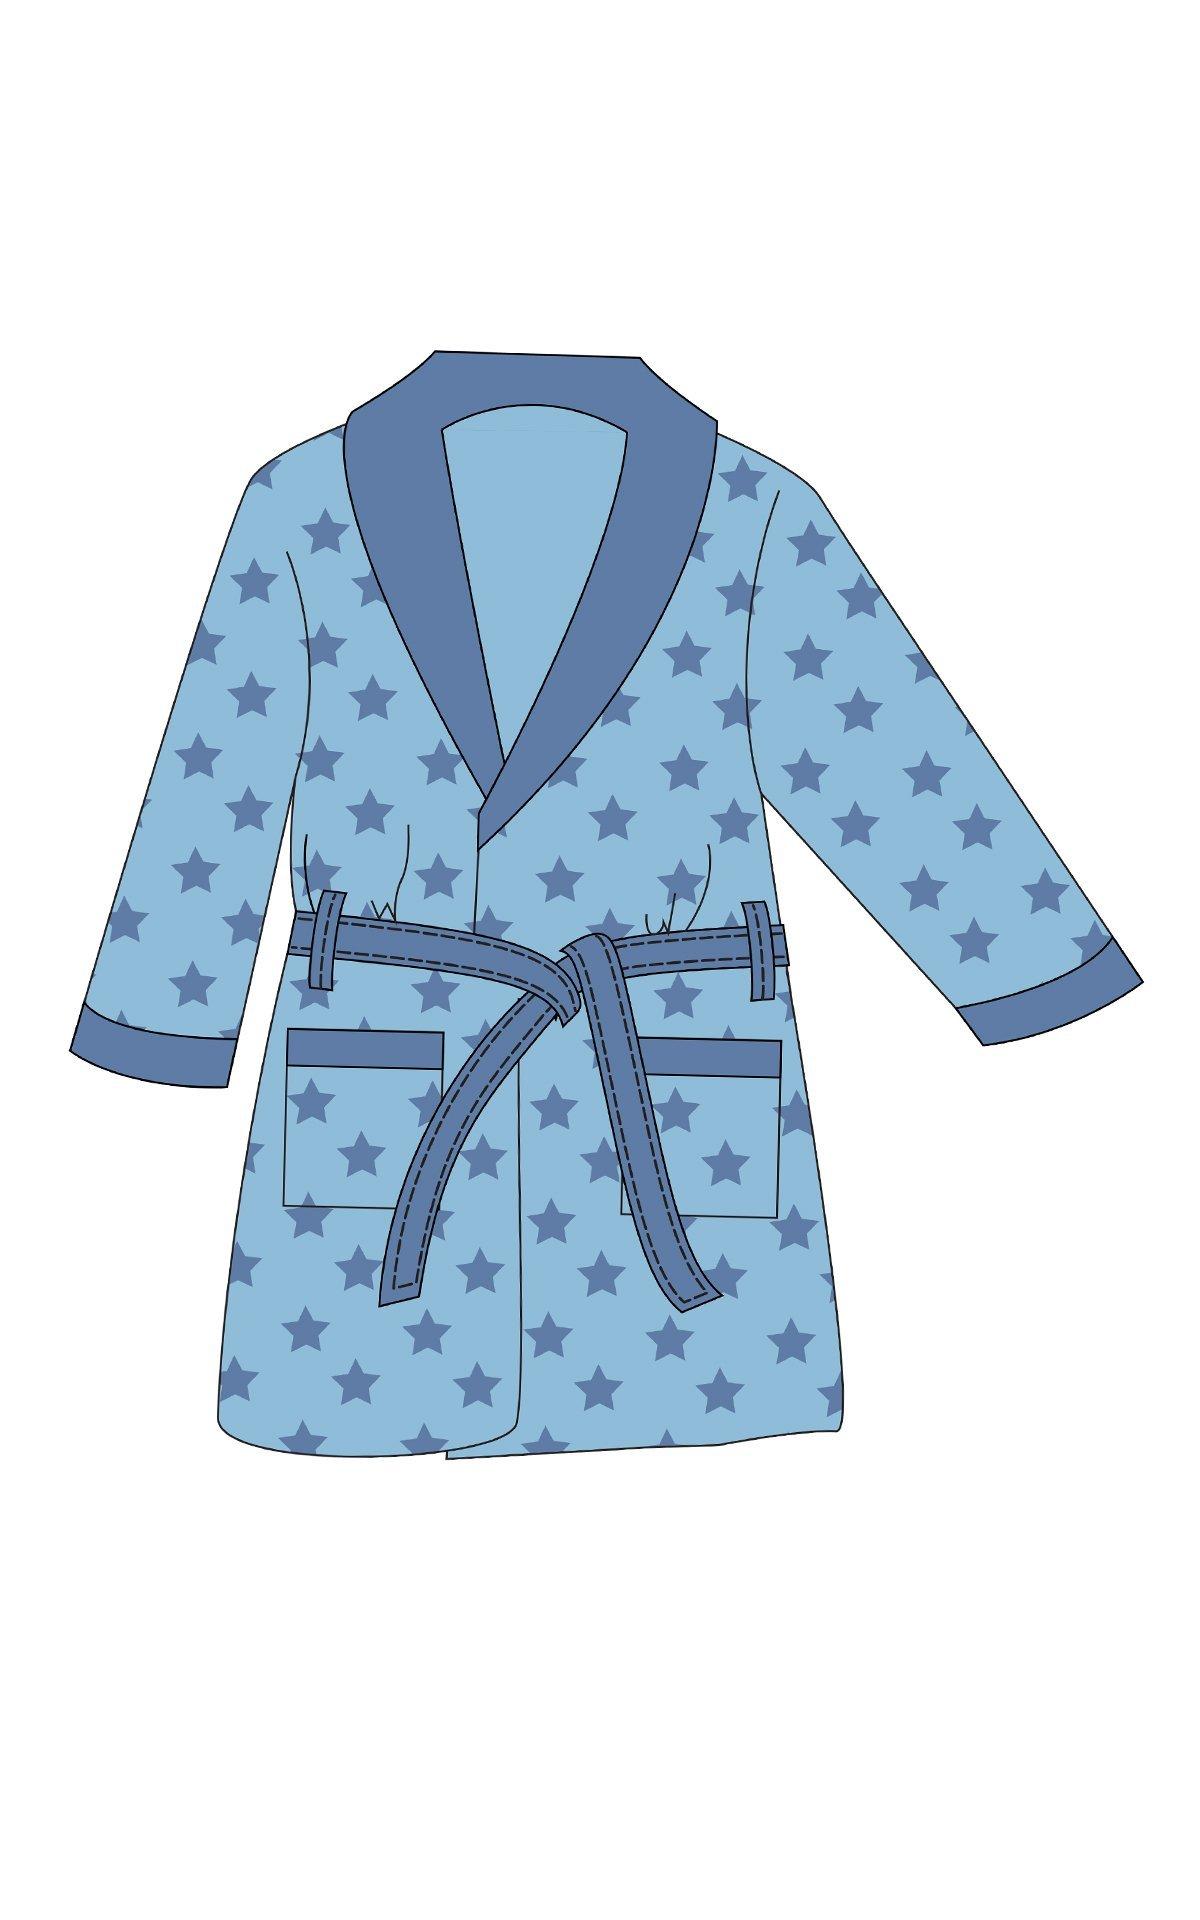 ba9c66b0b1e Παιδική Ρόμπα Fleece Minerva Σιέλ. Ιδανική για τις κρύες χειμωνιάτικες